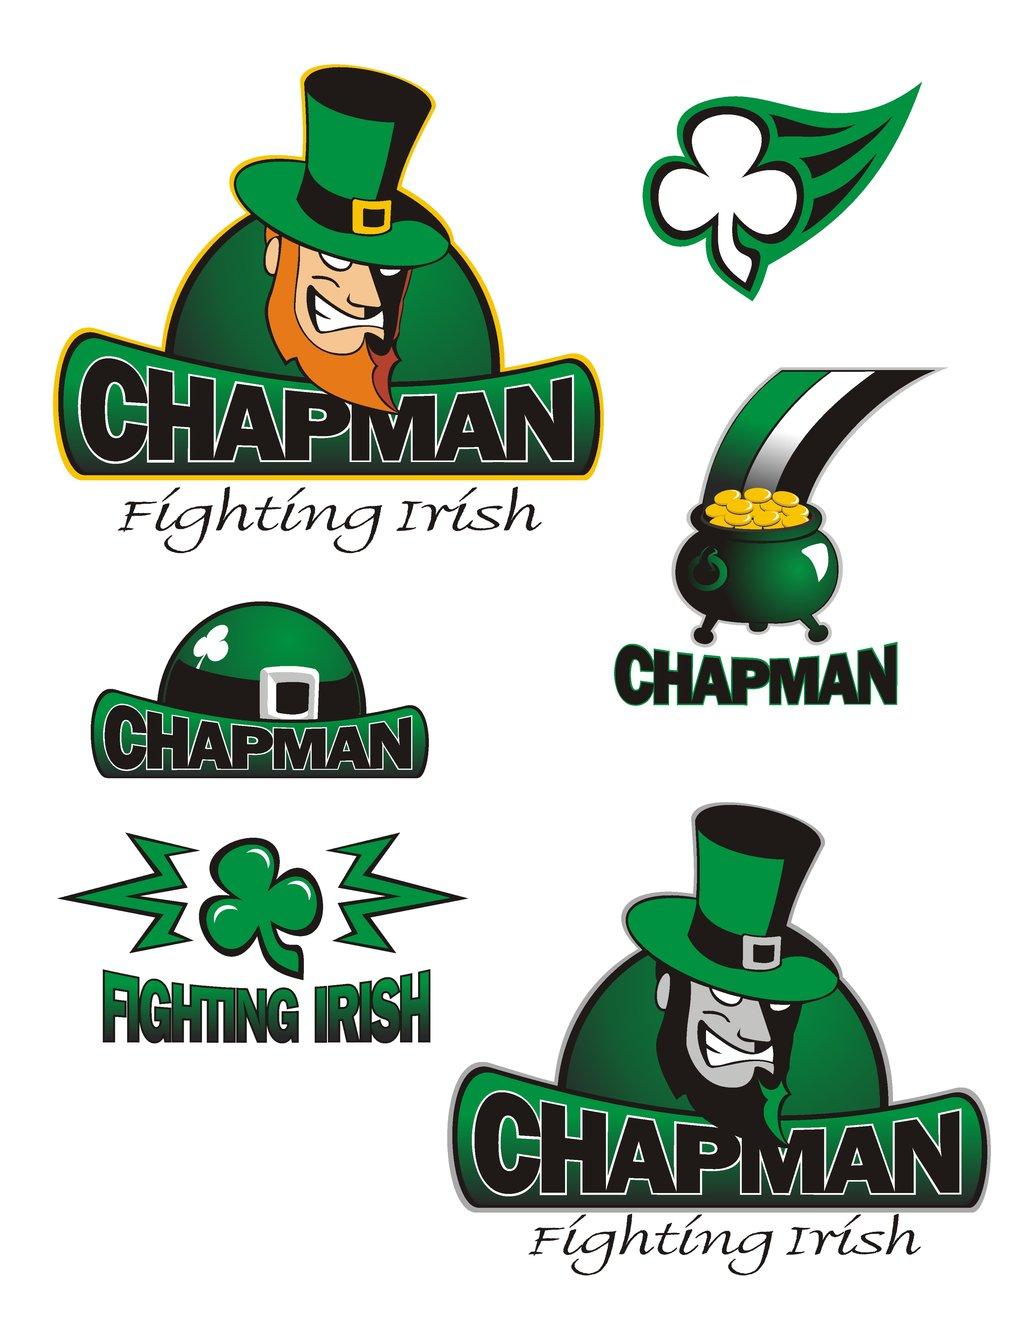 Chapman Fighting Irish Logos by travisself 1024x1325